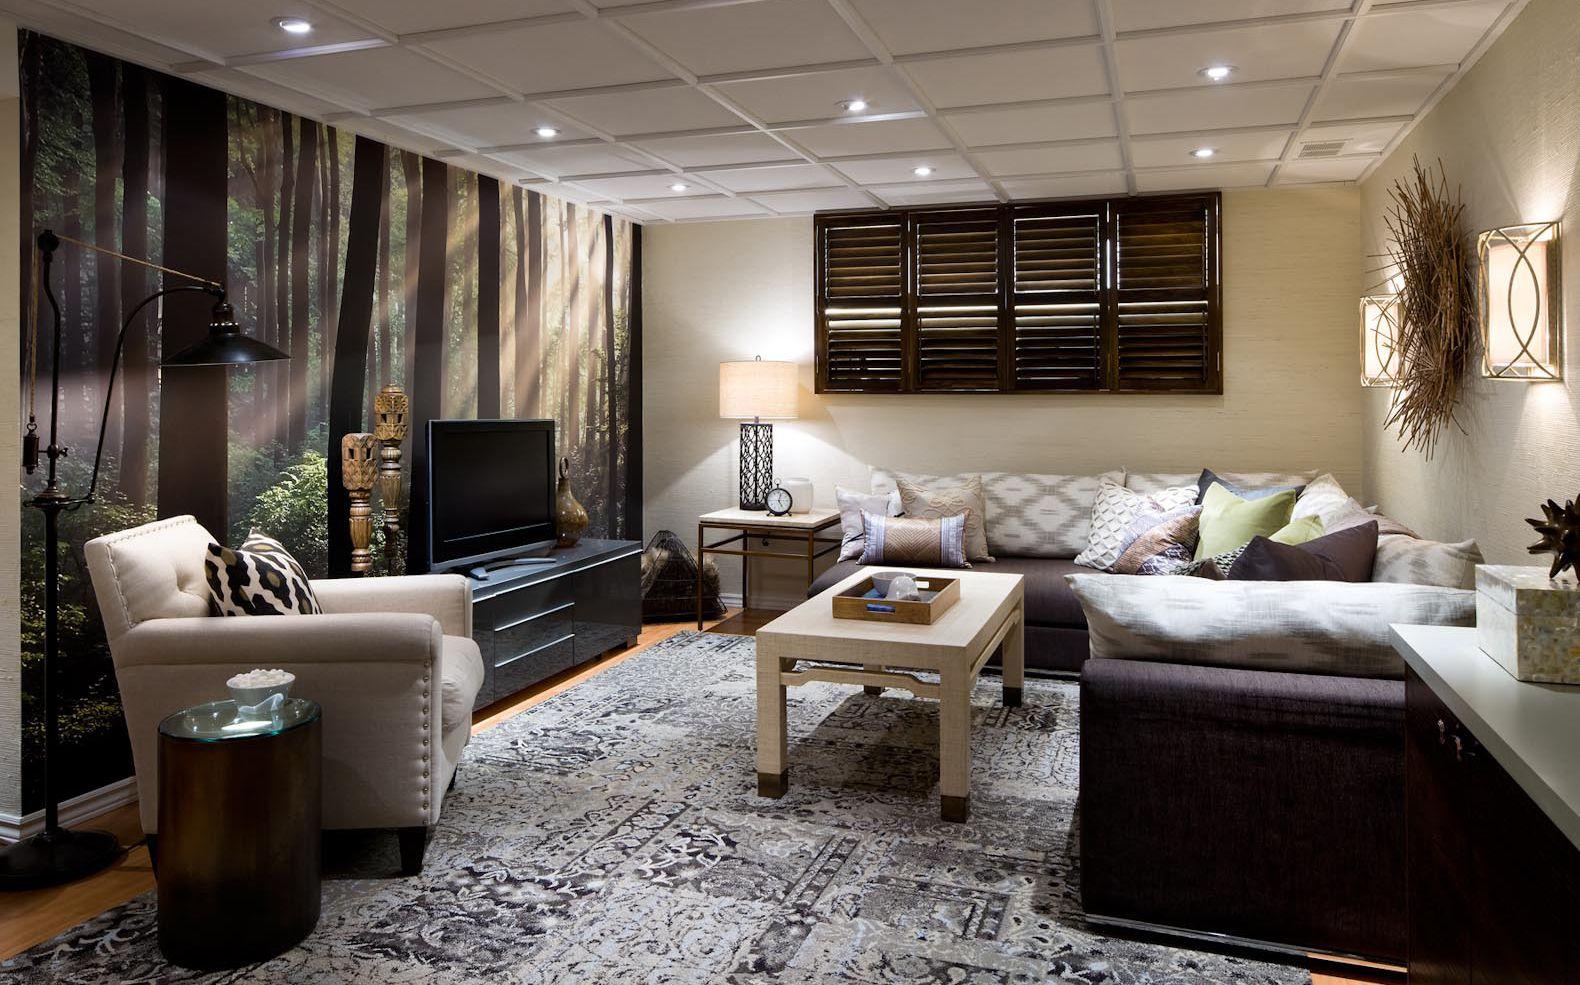 Candice Olson Interior Design Interior interiorcreativemodernlivingroominspirationwithfuturistic